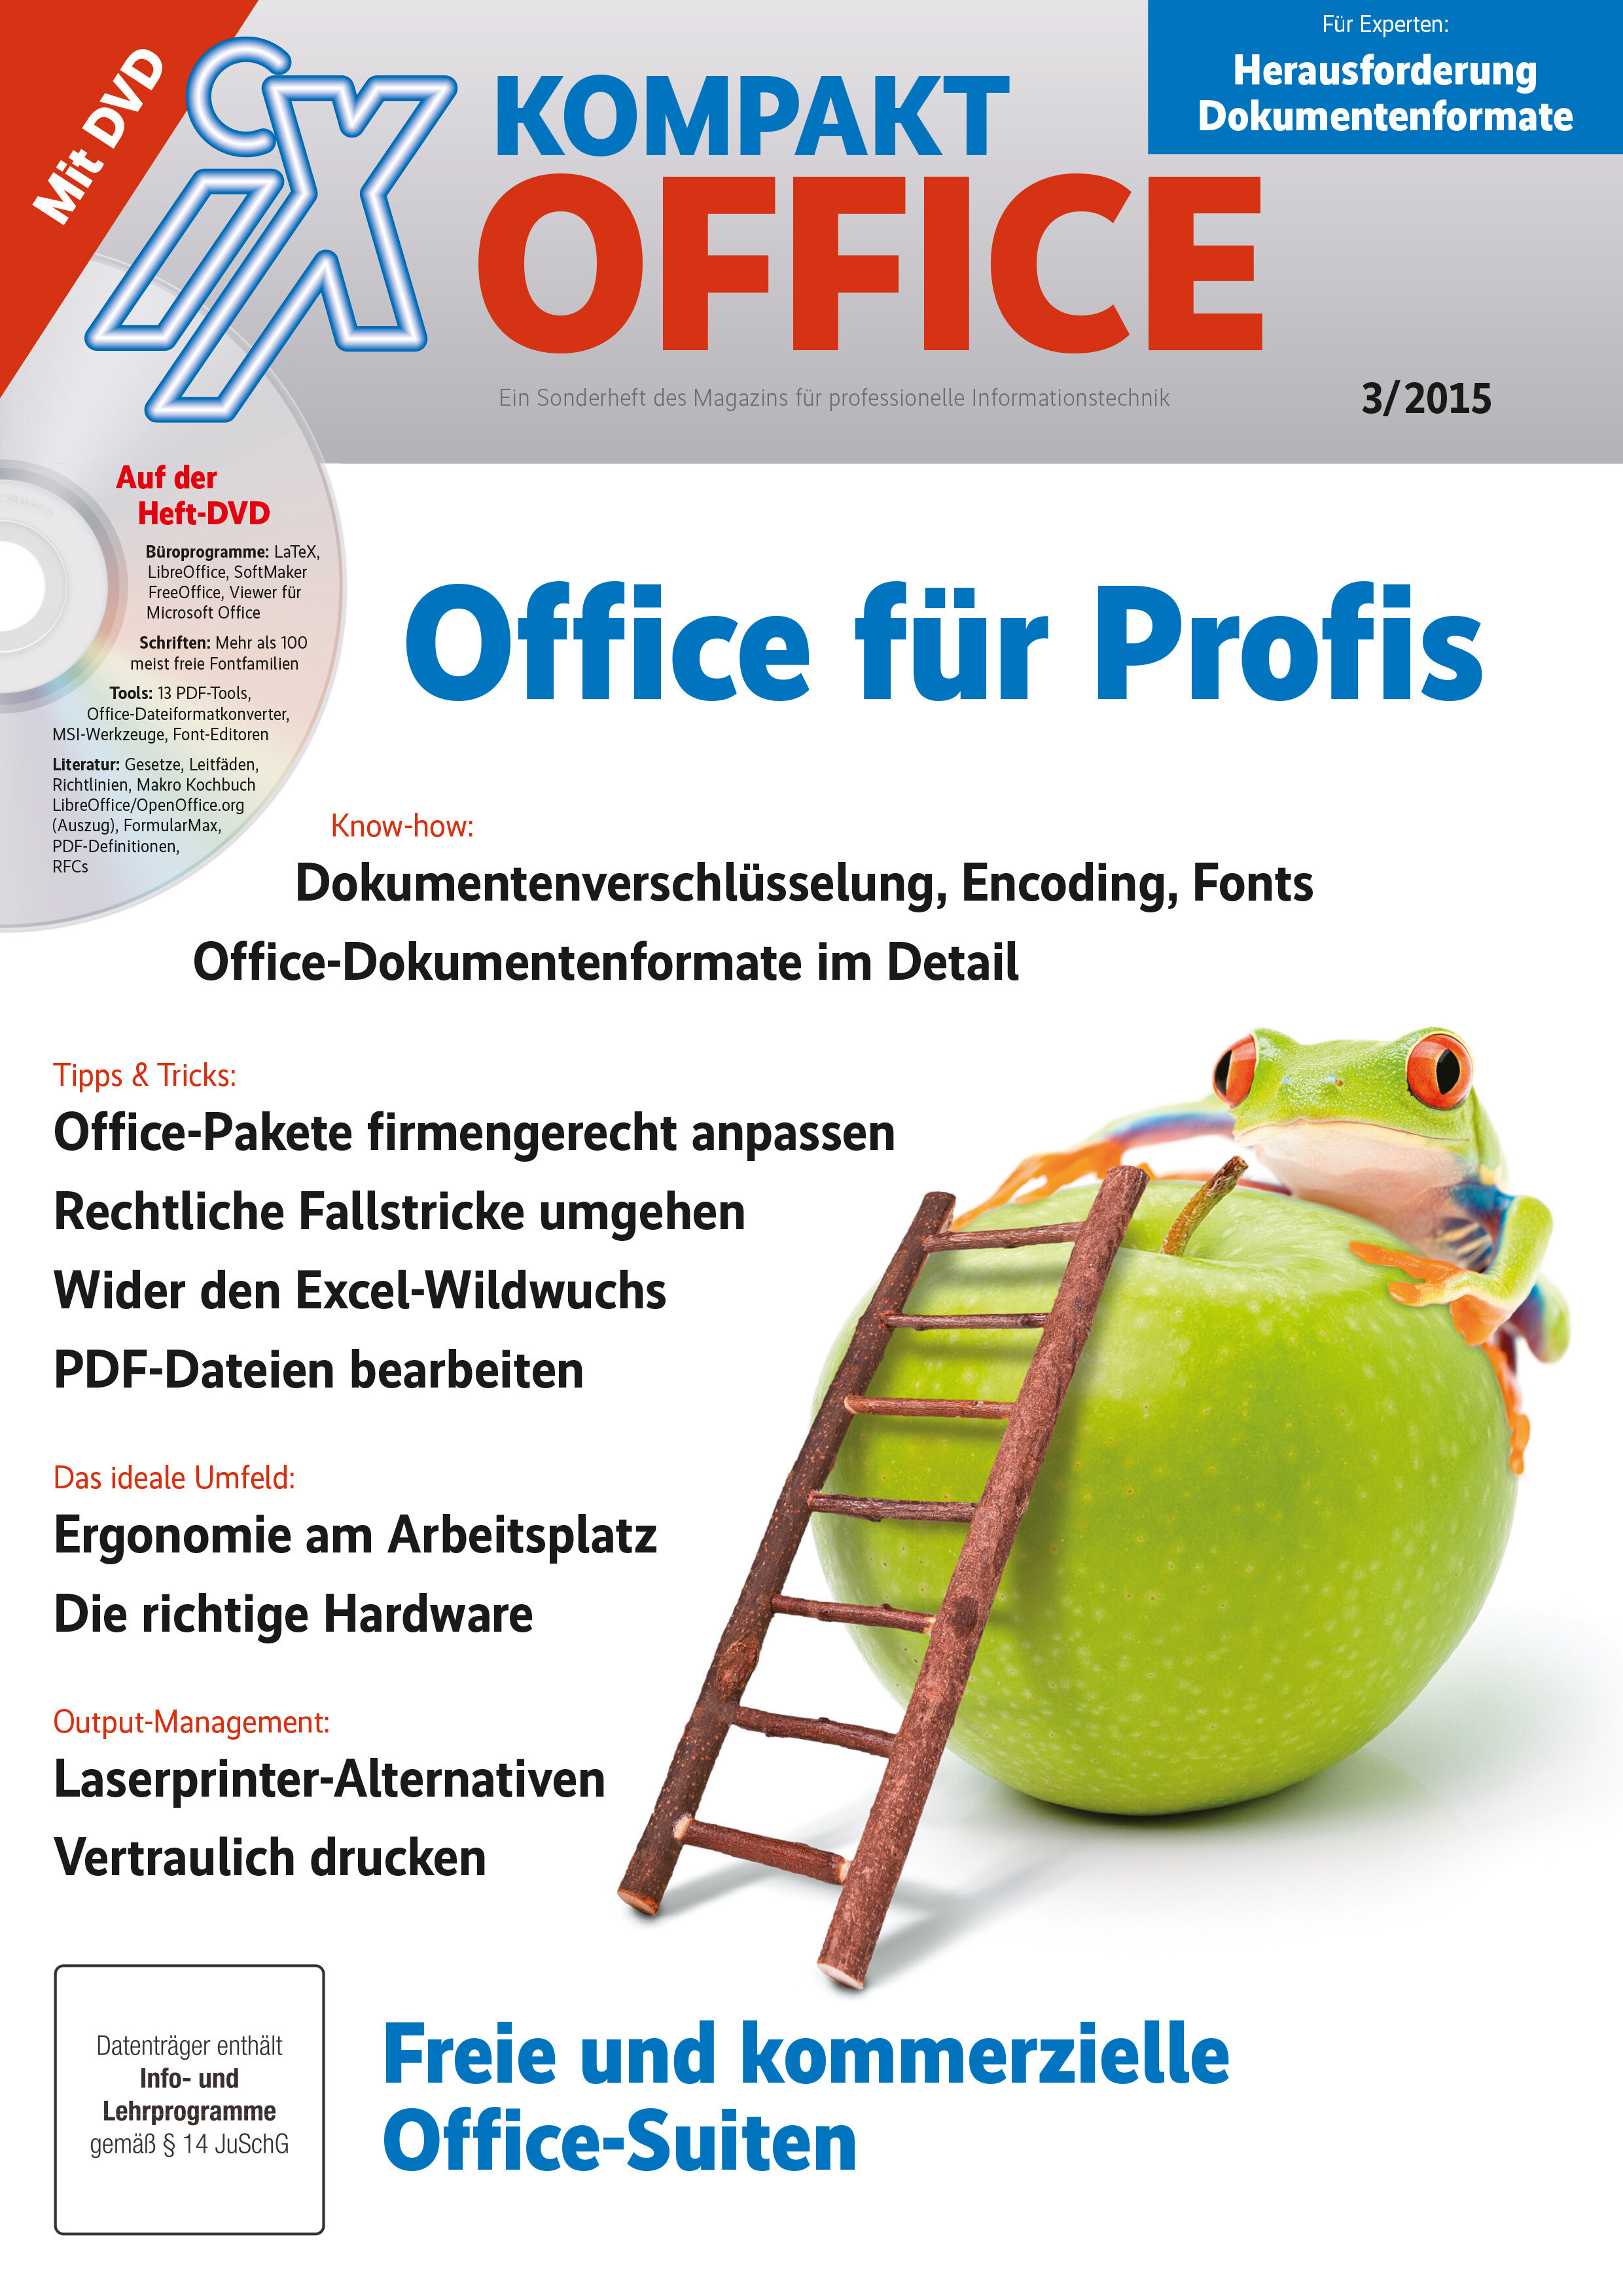 iX kompakt Office 2015